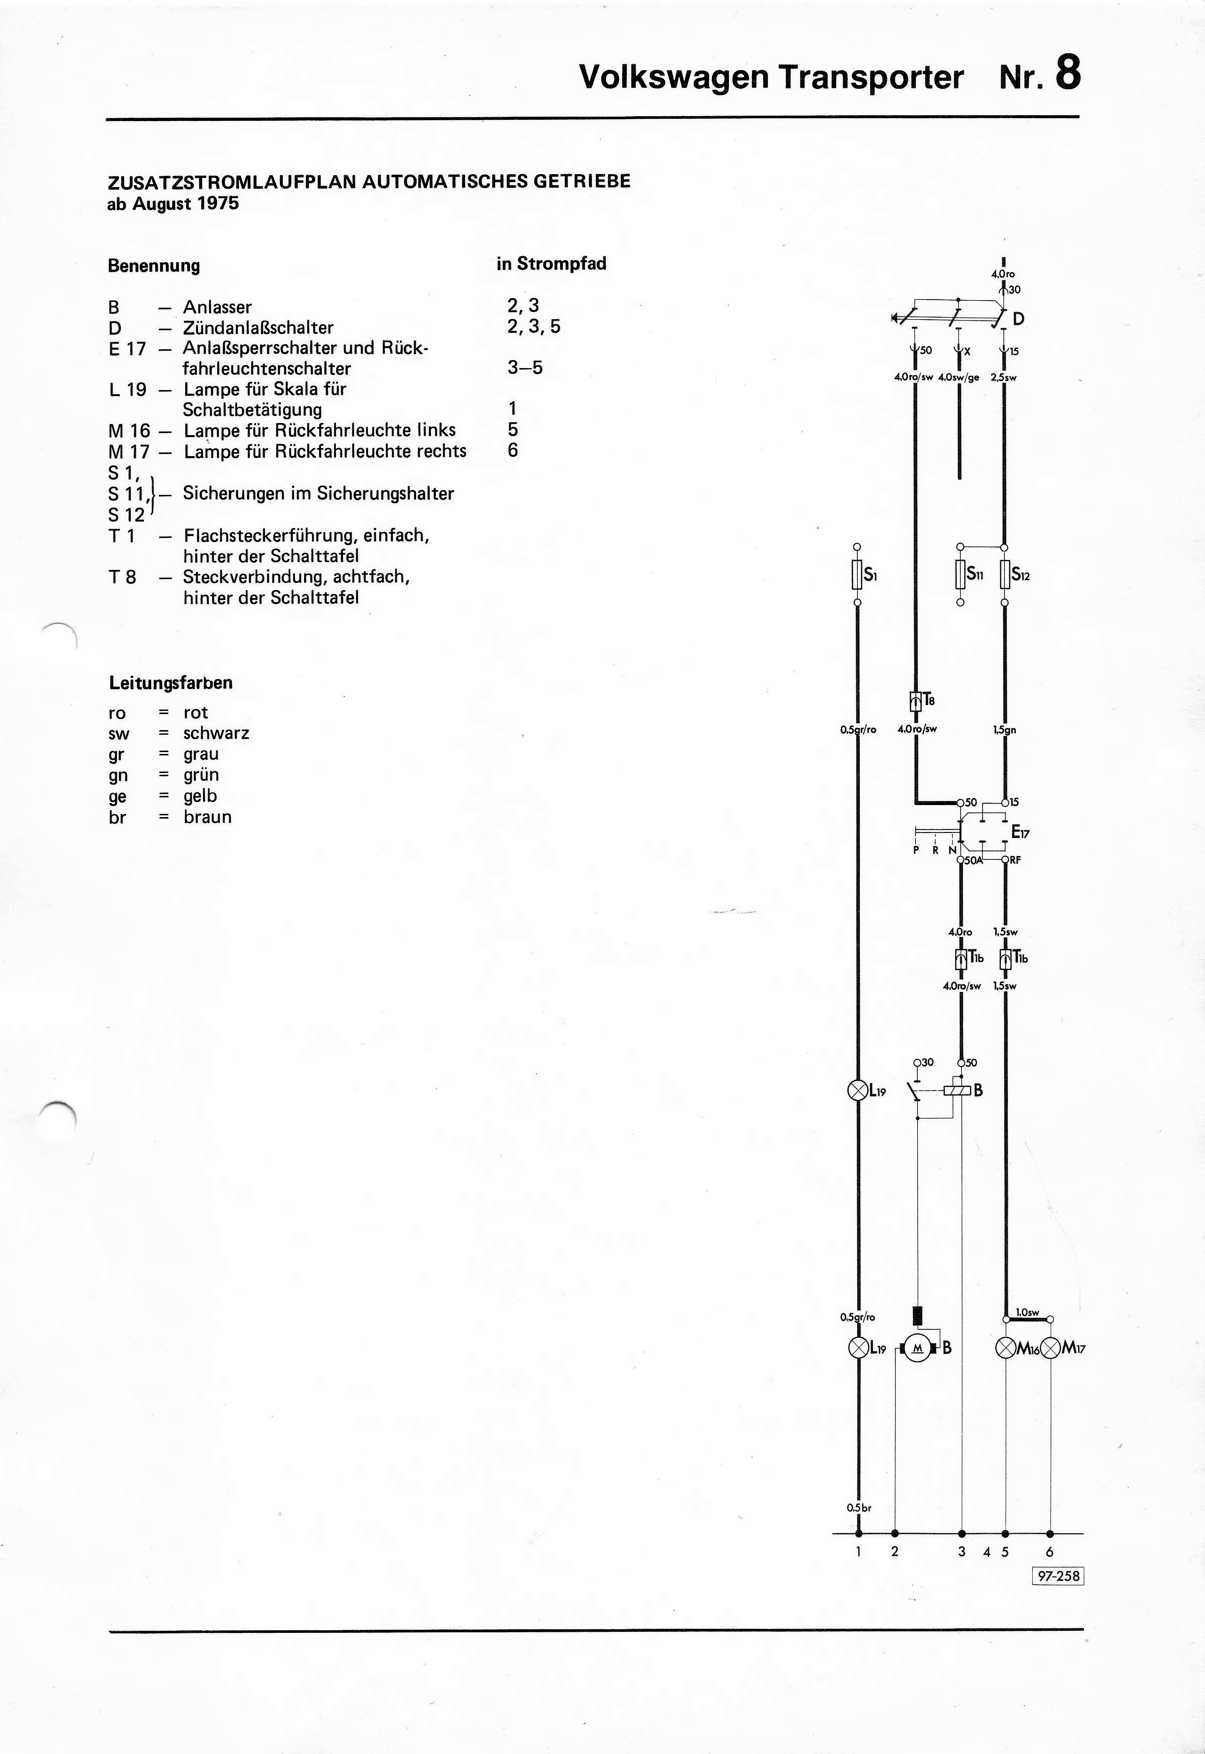 similiar 70 vw wiring diagram keywords diagram furthermore 73 vw wiring diagrams on 70 vw wiring diagram